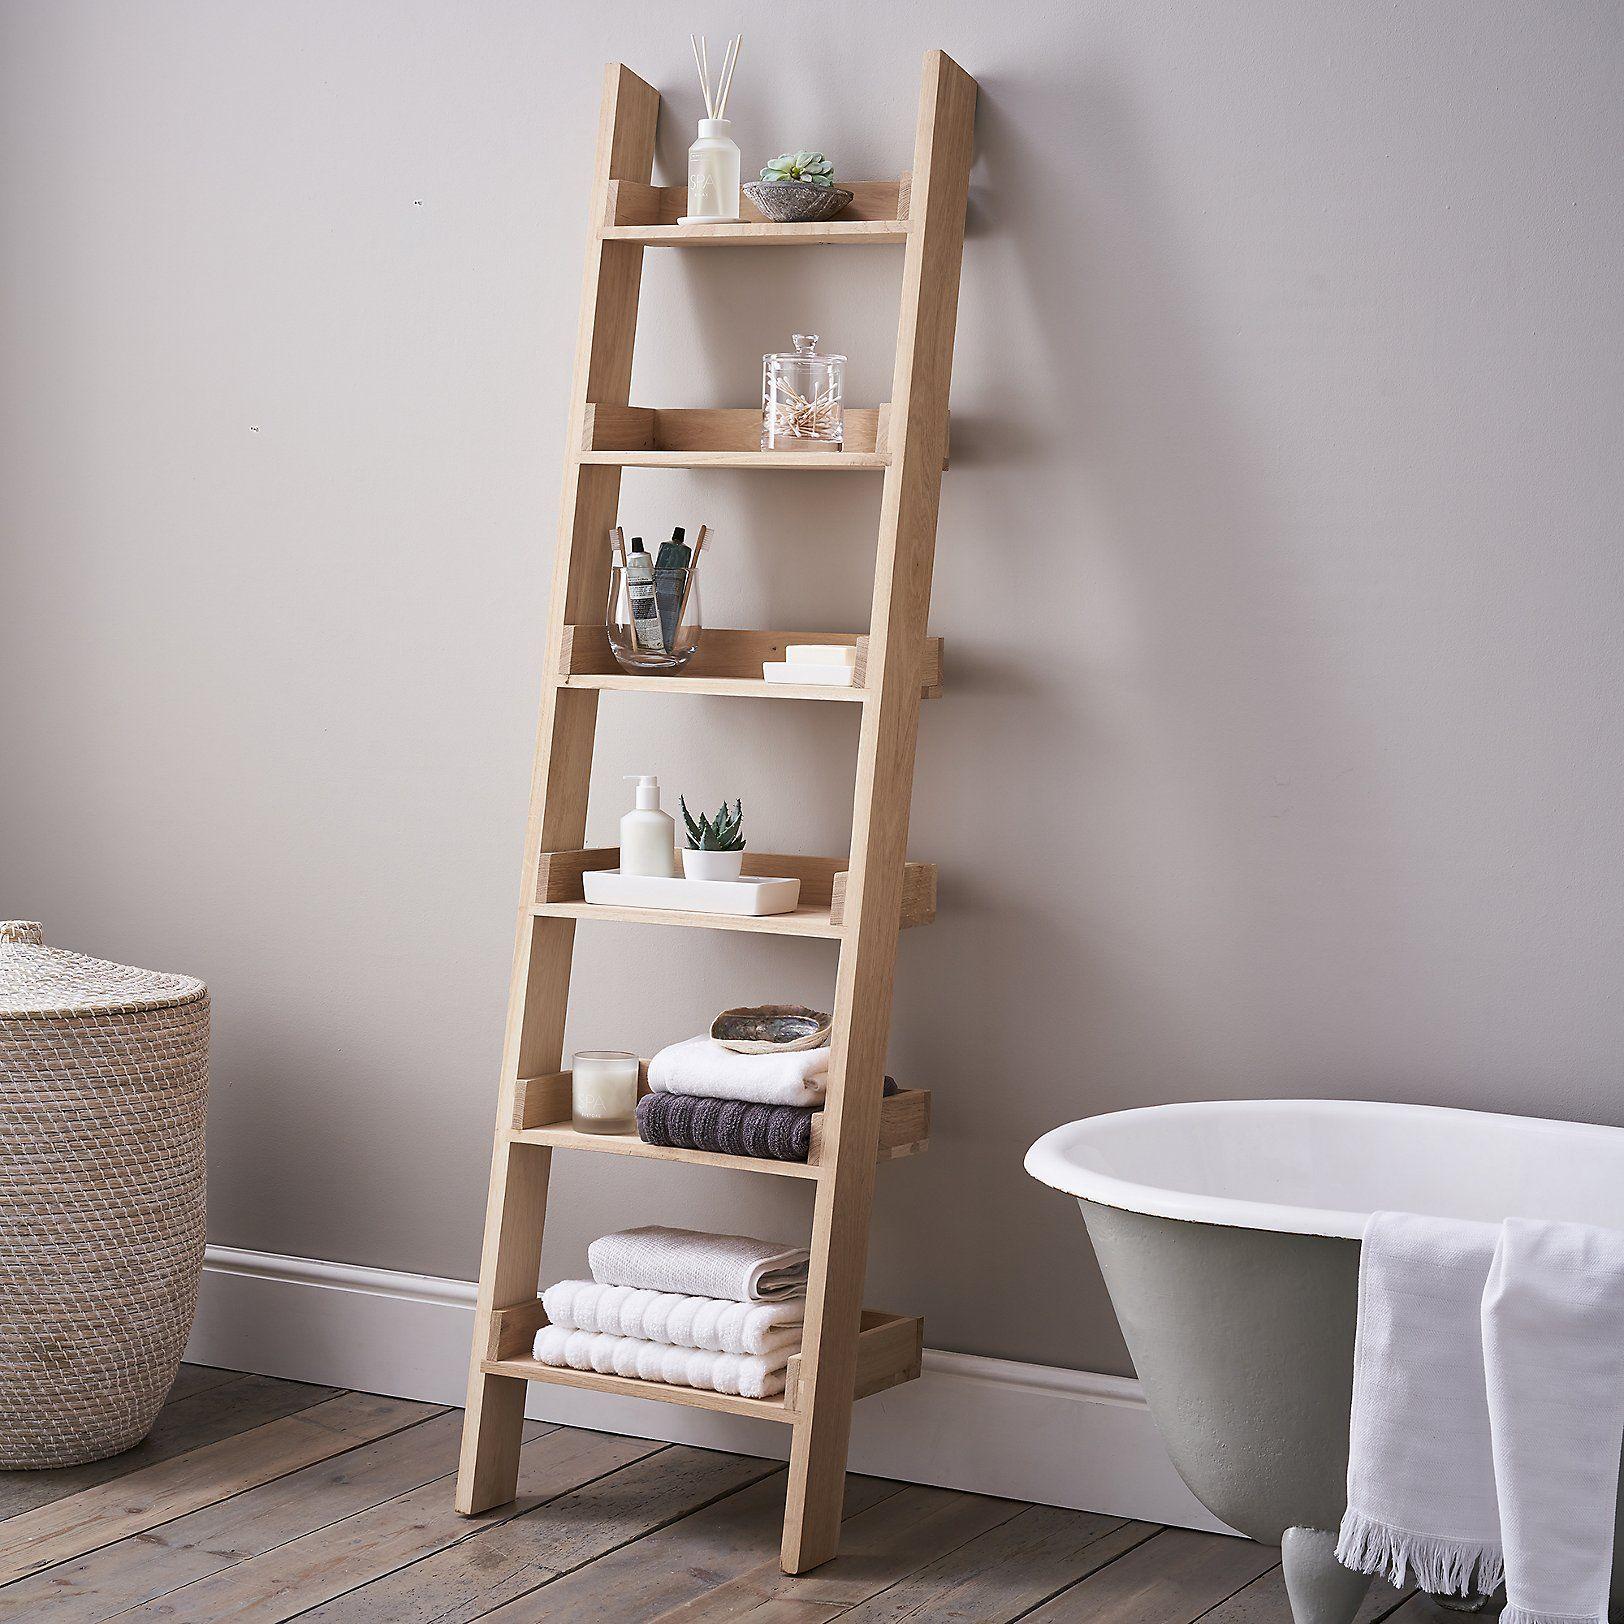 Modern Bookcase Leaning Bookcase Ladder Shelf Mid Century Etsy In 2020 Leaning Bookcase Shelves Shelves In Bedroom